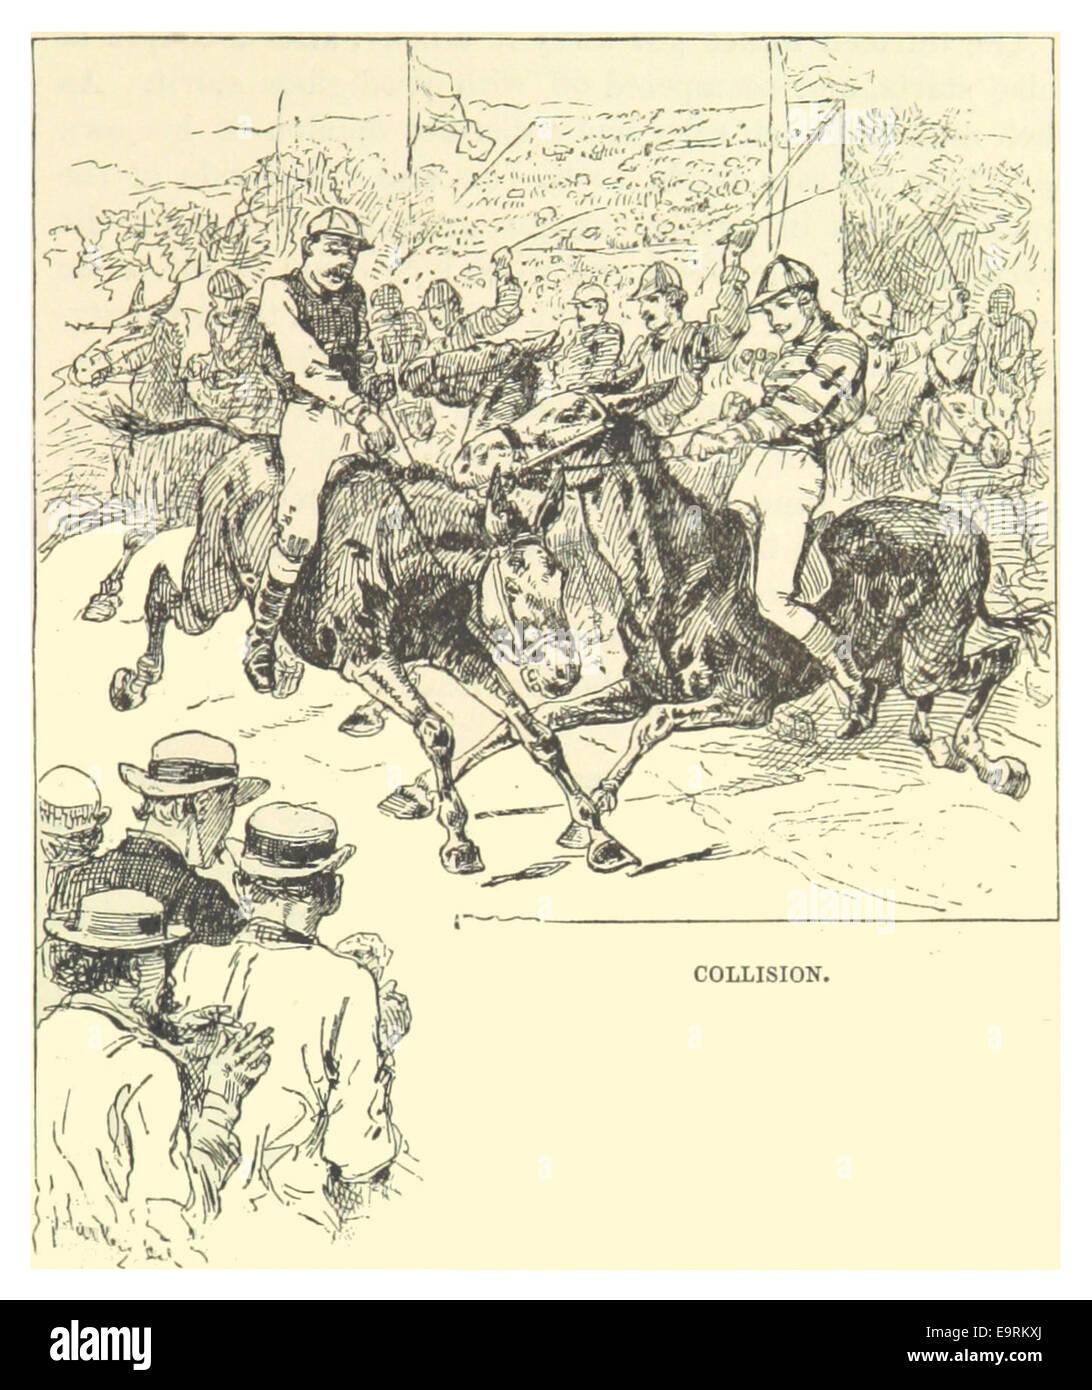 MARK TWAIN(1883) p469 - COLLISION Stock Photo, Royalty Free Image ...